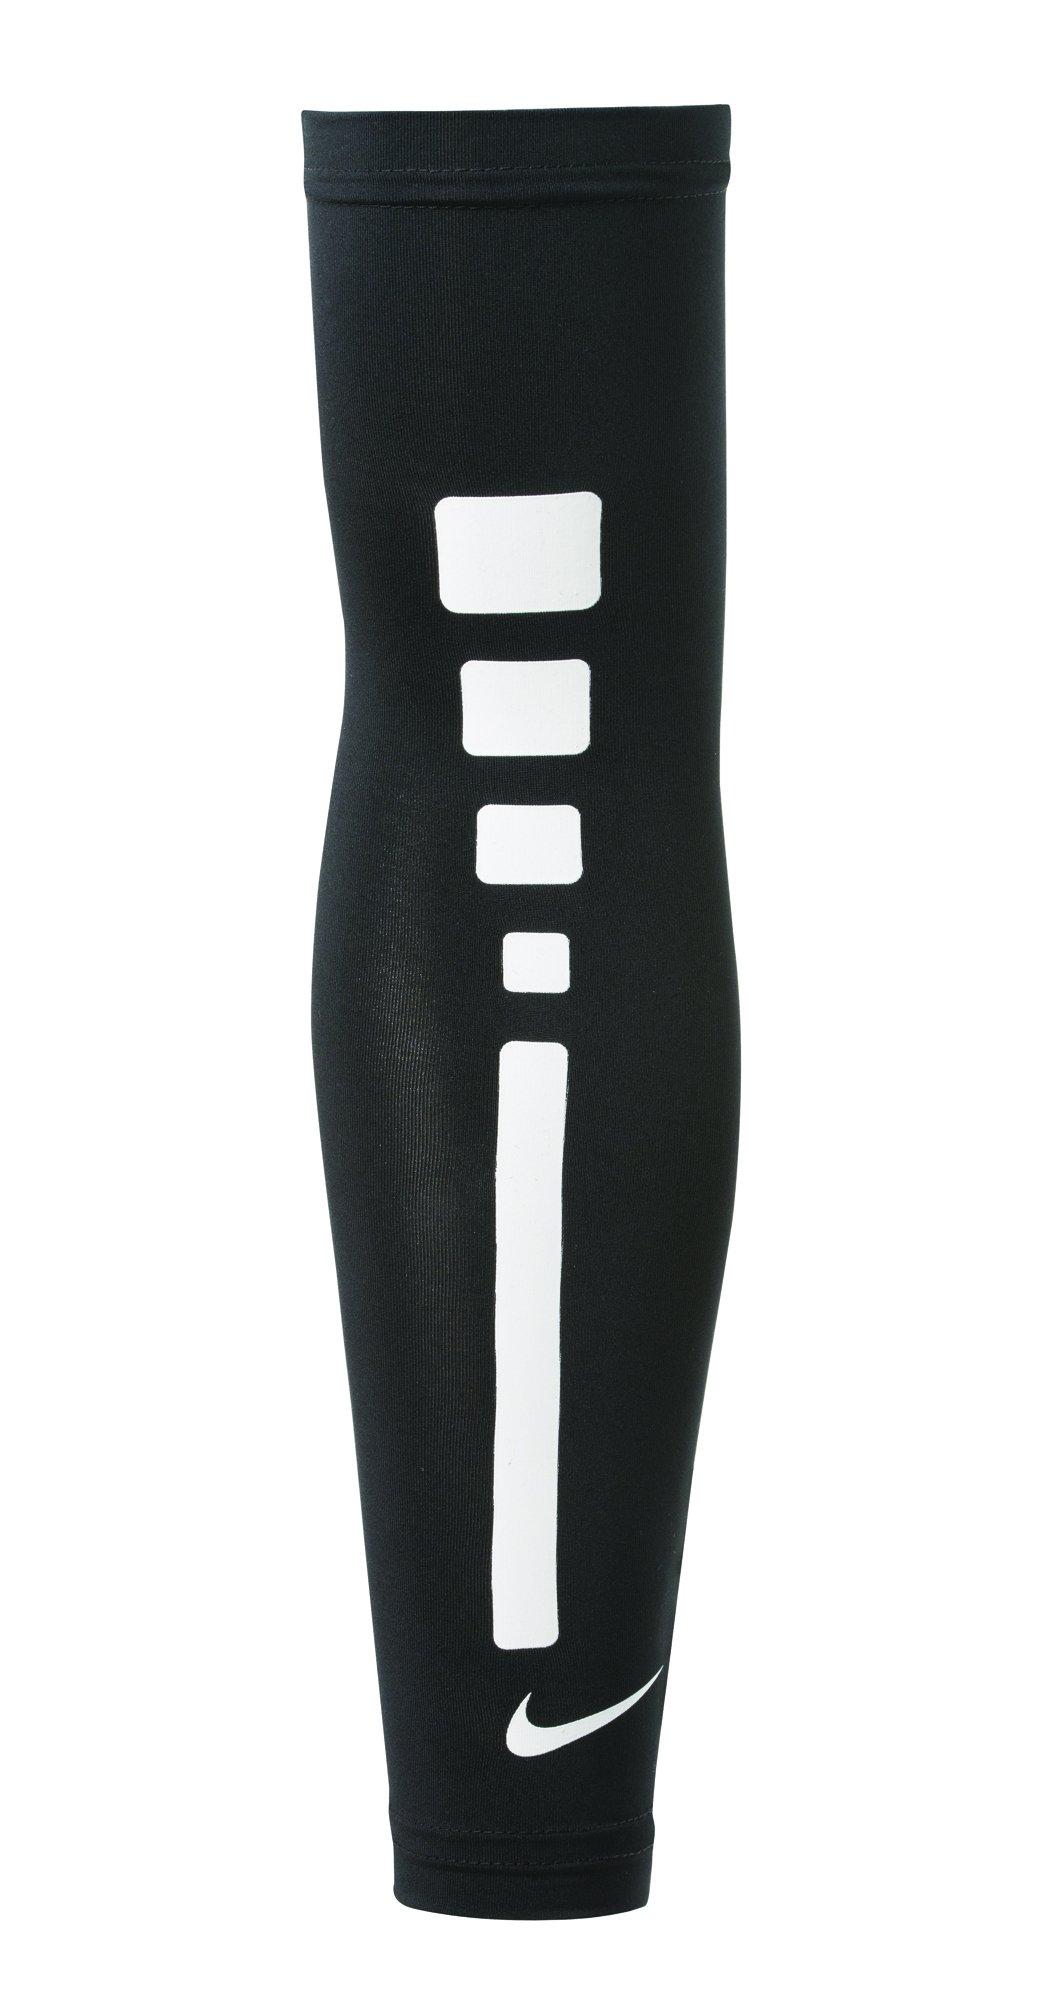 NIKE Men's Pro Combat Elite Sleeve (Black/White/White, S/M)